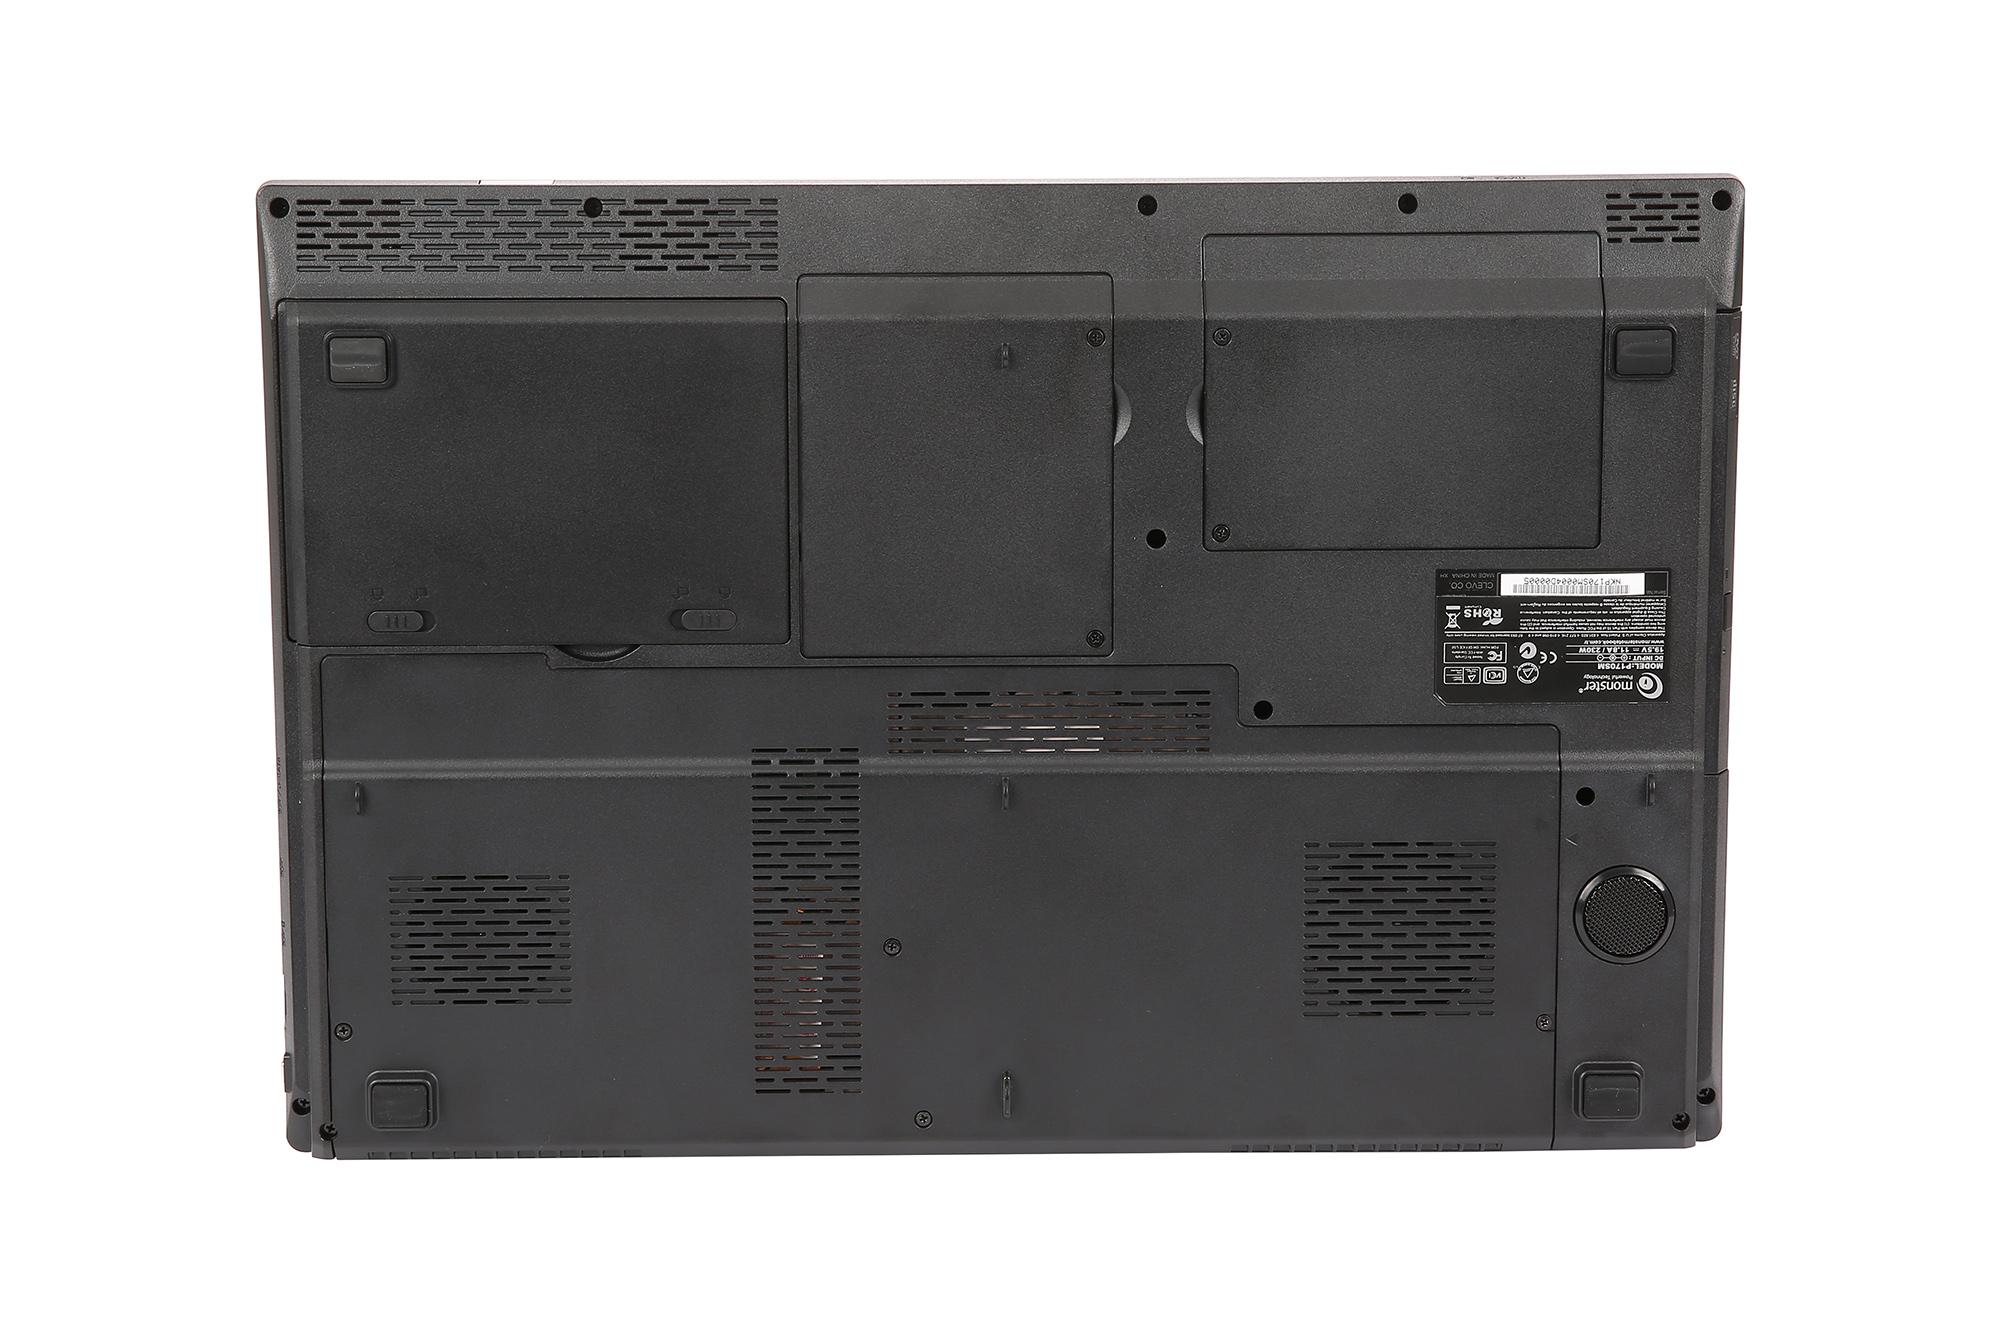 MONSTER® TULPAR T7 V1.1 17.3